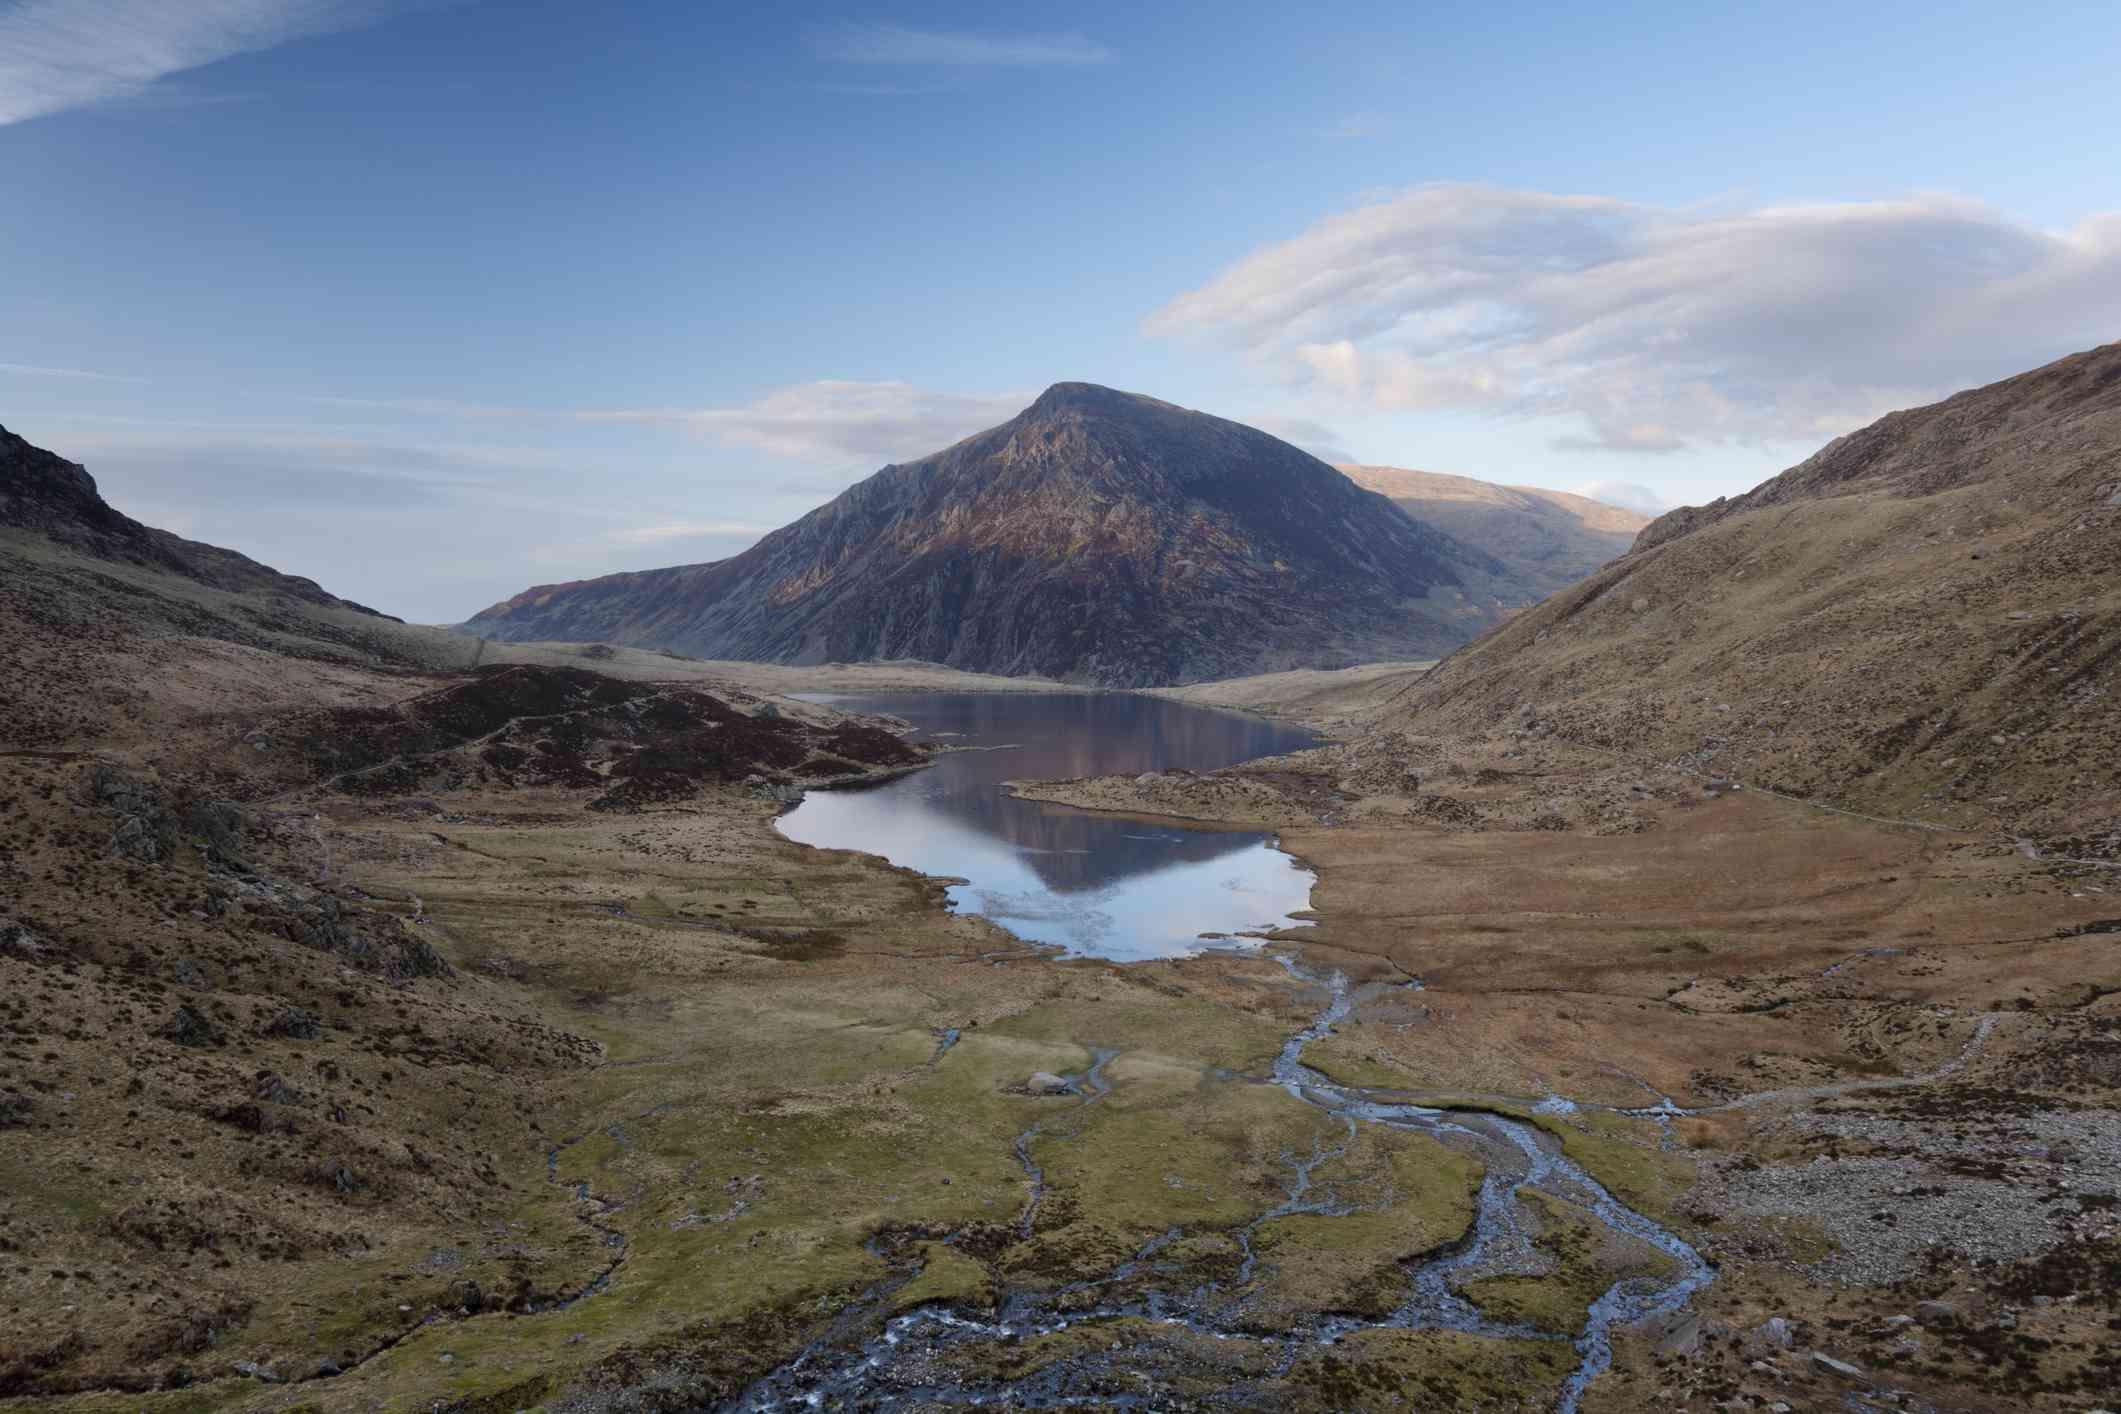 Llyn Idwal lake and Pen yr Ole Wen mountain in Snowdonia